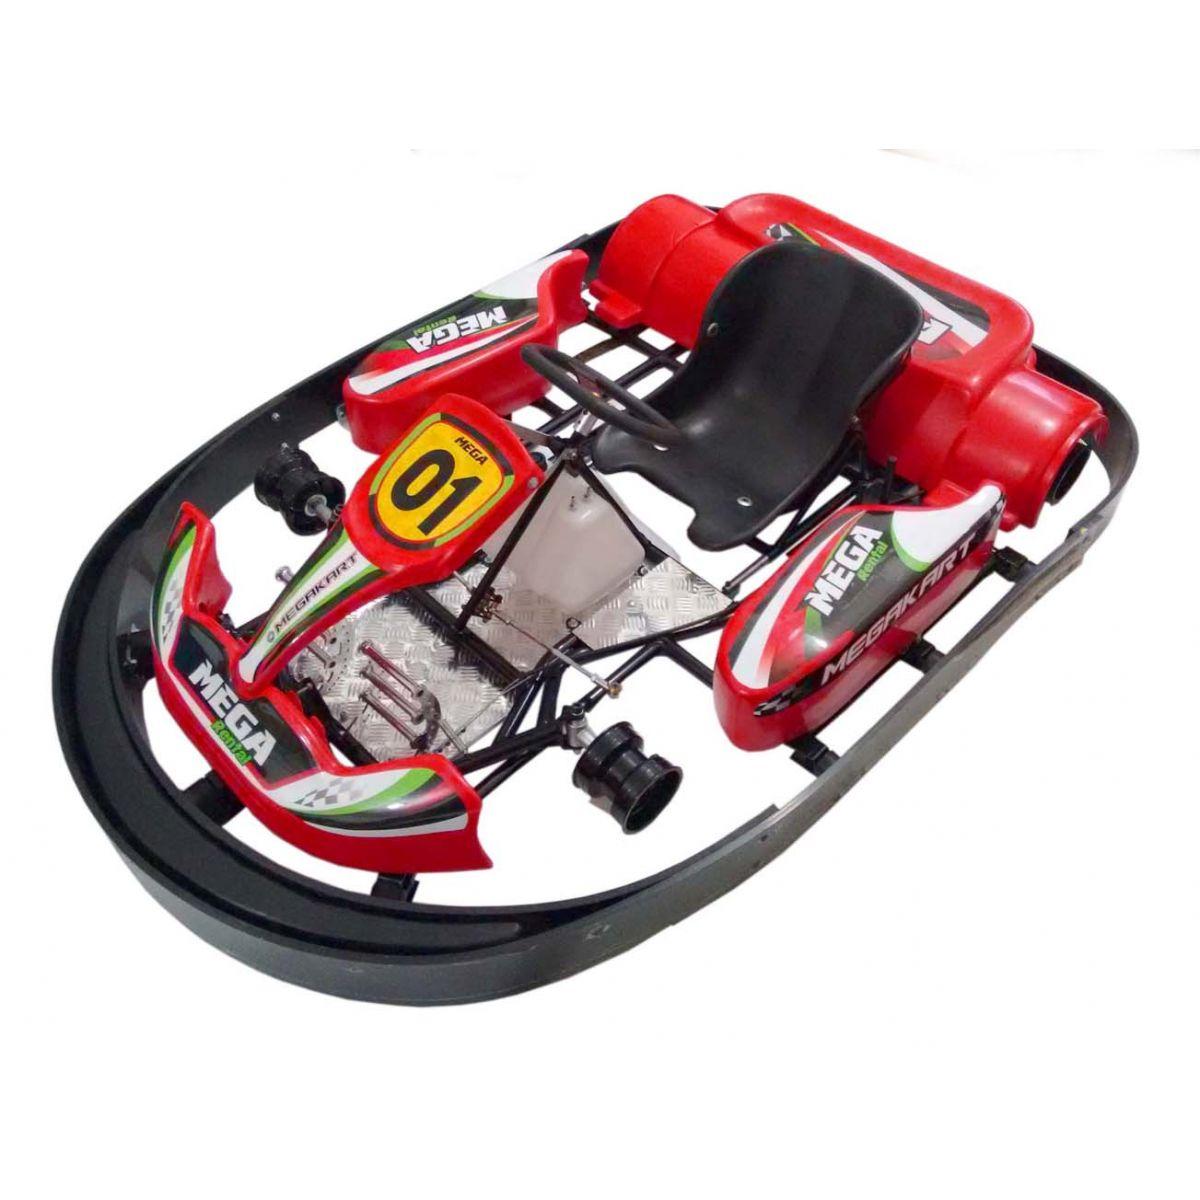 Kart Indoor com Amortecedo de Choque - 324   - Mega Kart